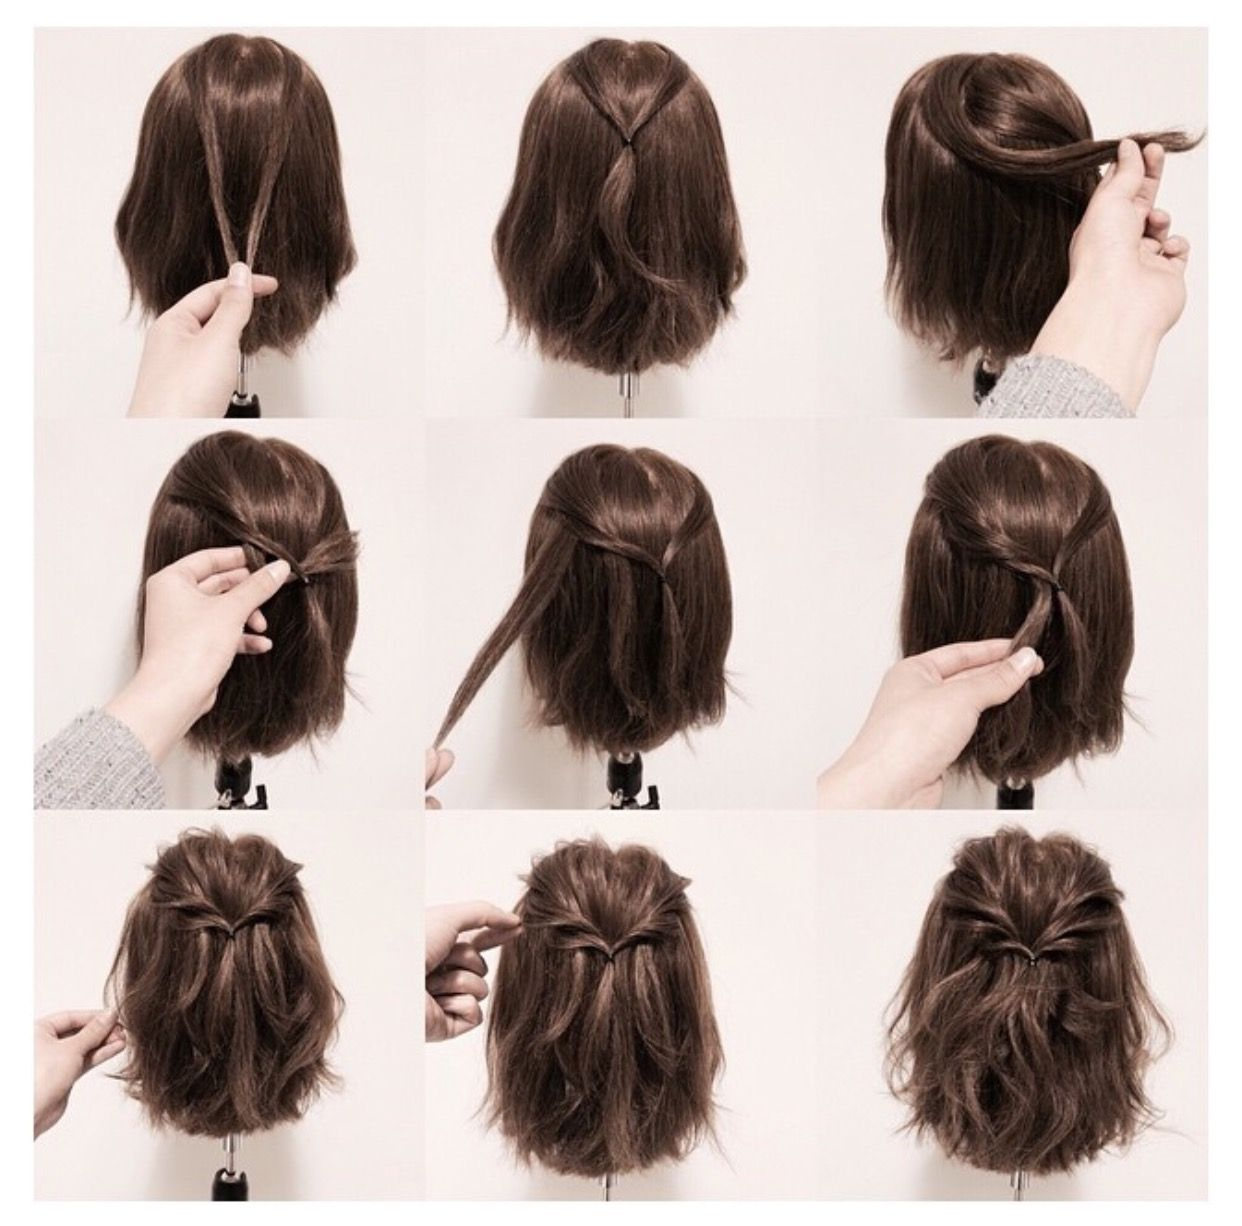 Pin by hannah ferwerda on super cute dous pinterest hair style